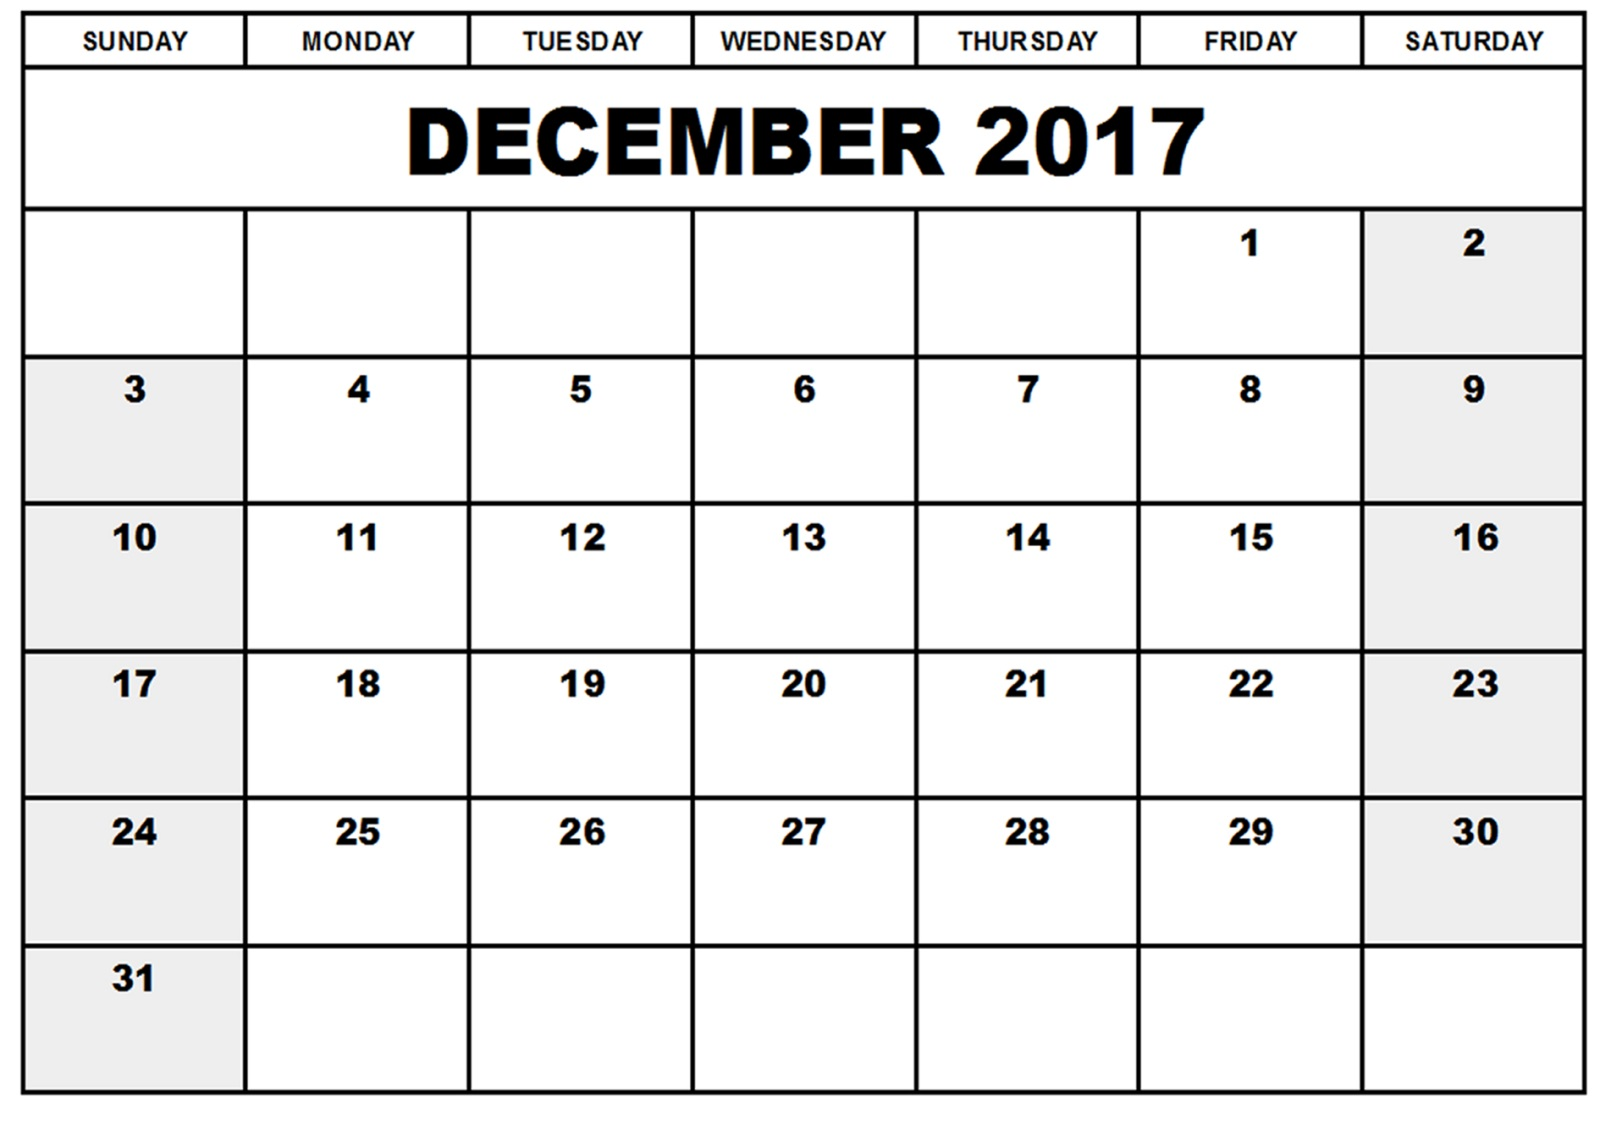 december 2017 calendar pages